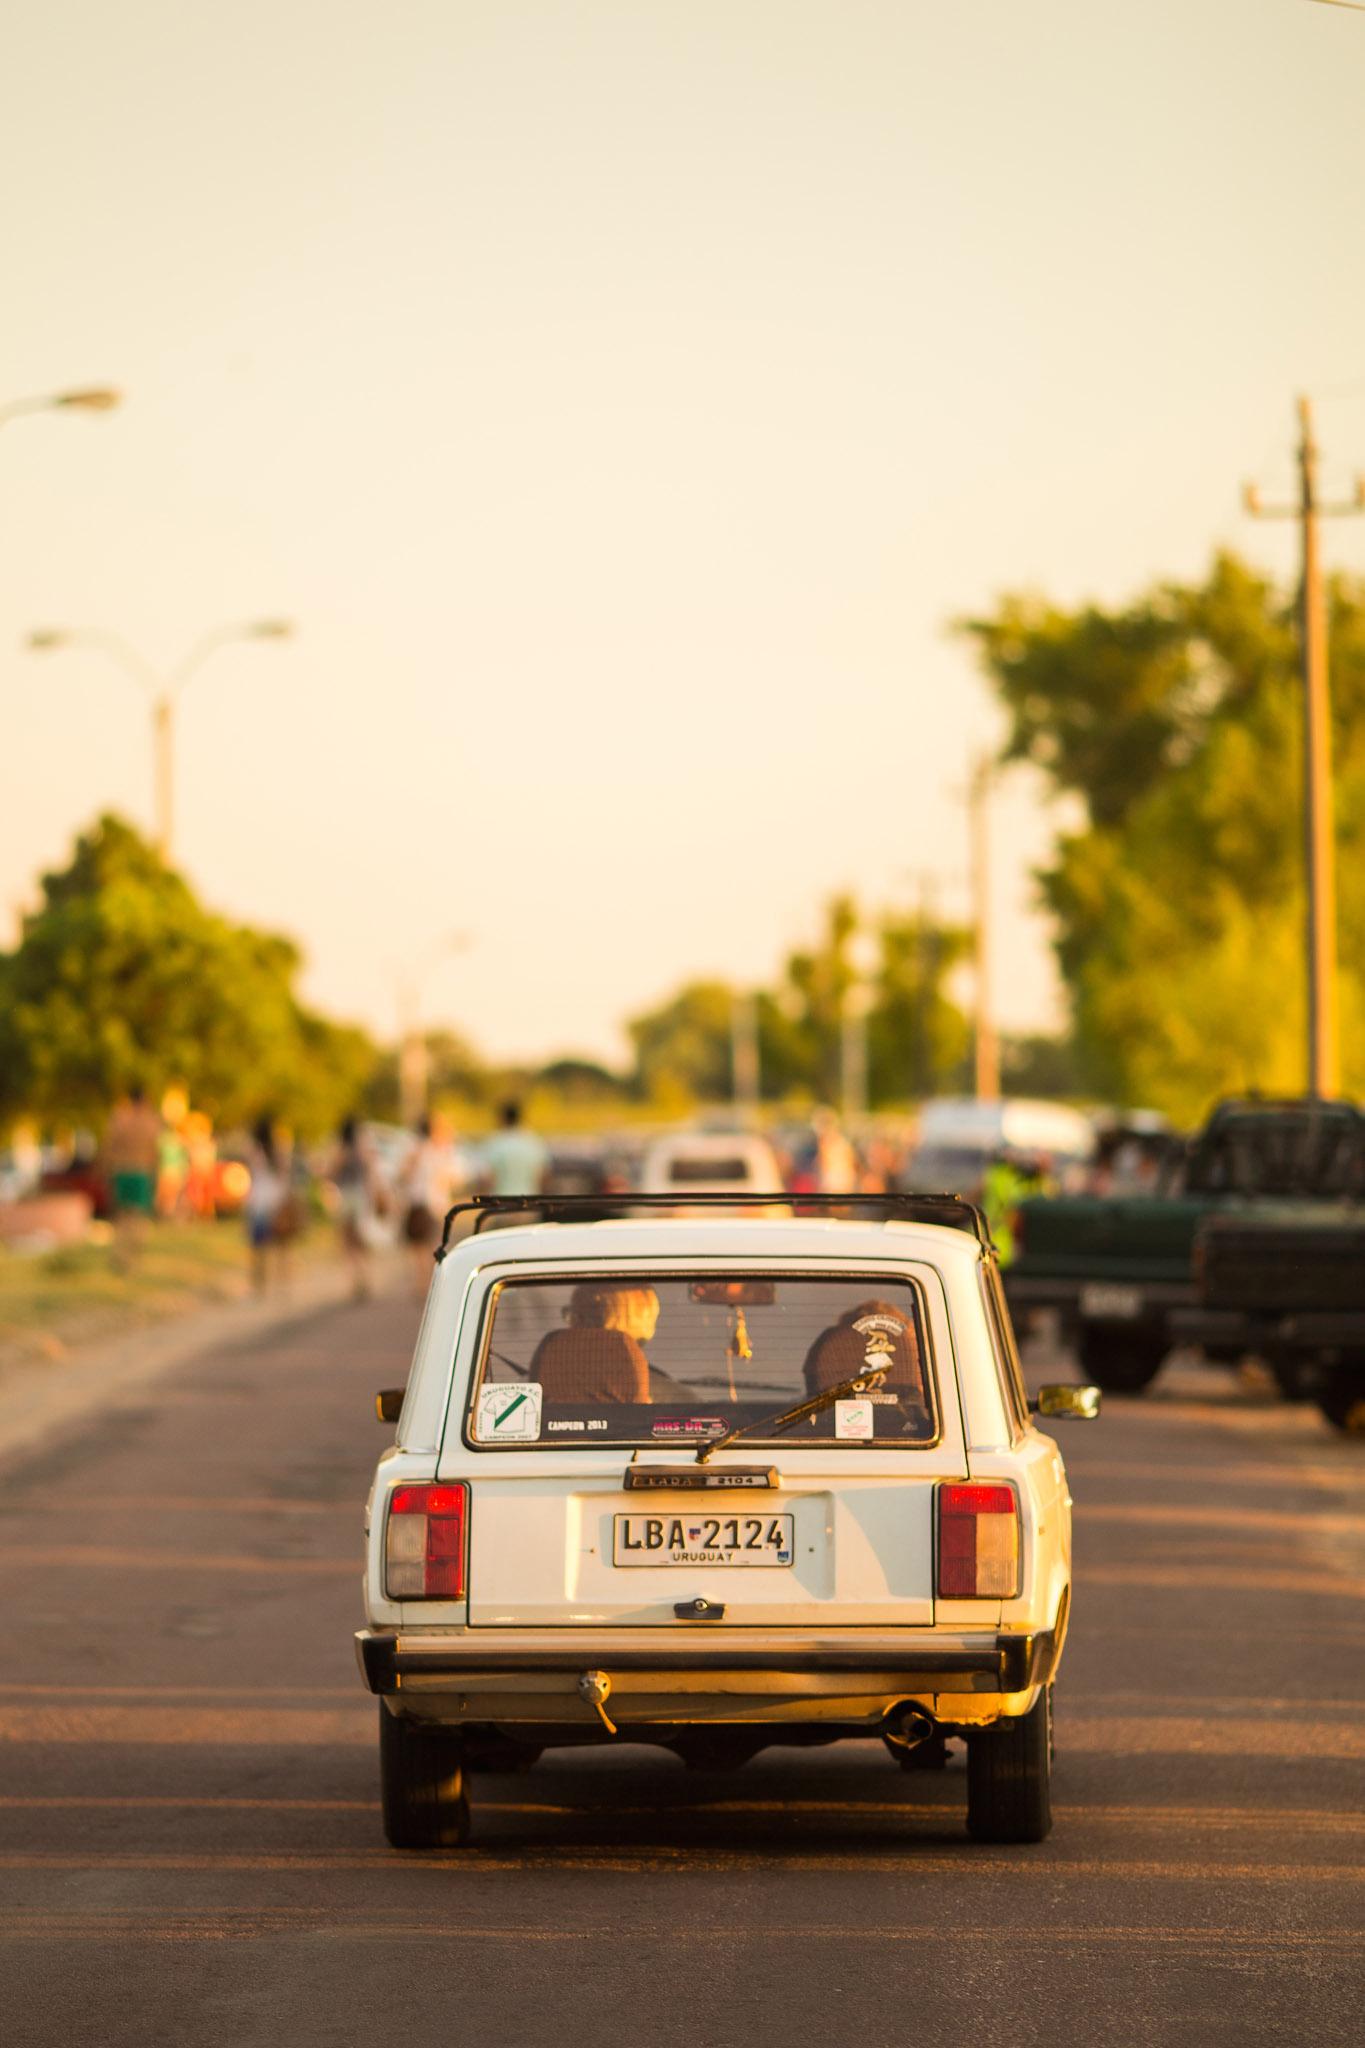 Wedding_Travellers_Uruguay_Traveling-Overland-lada-old-car.jpg